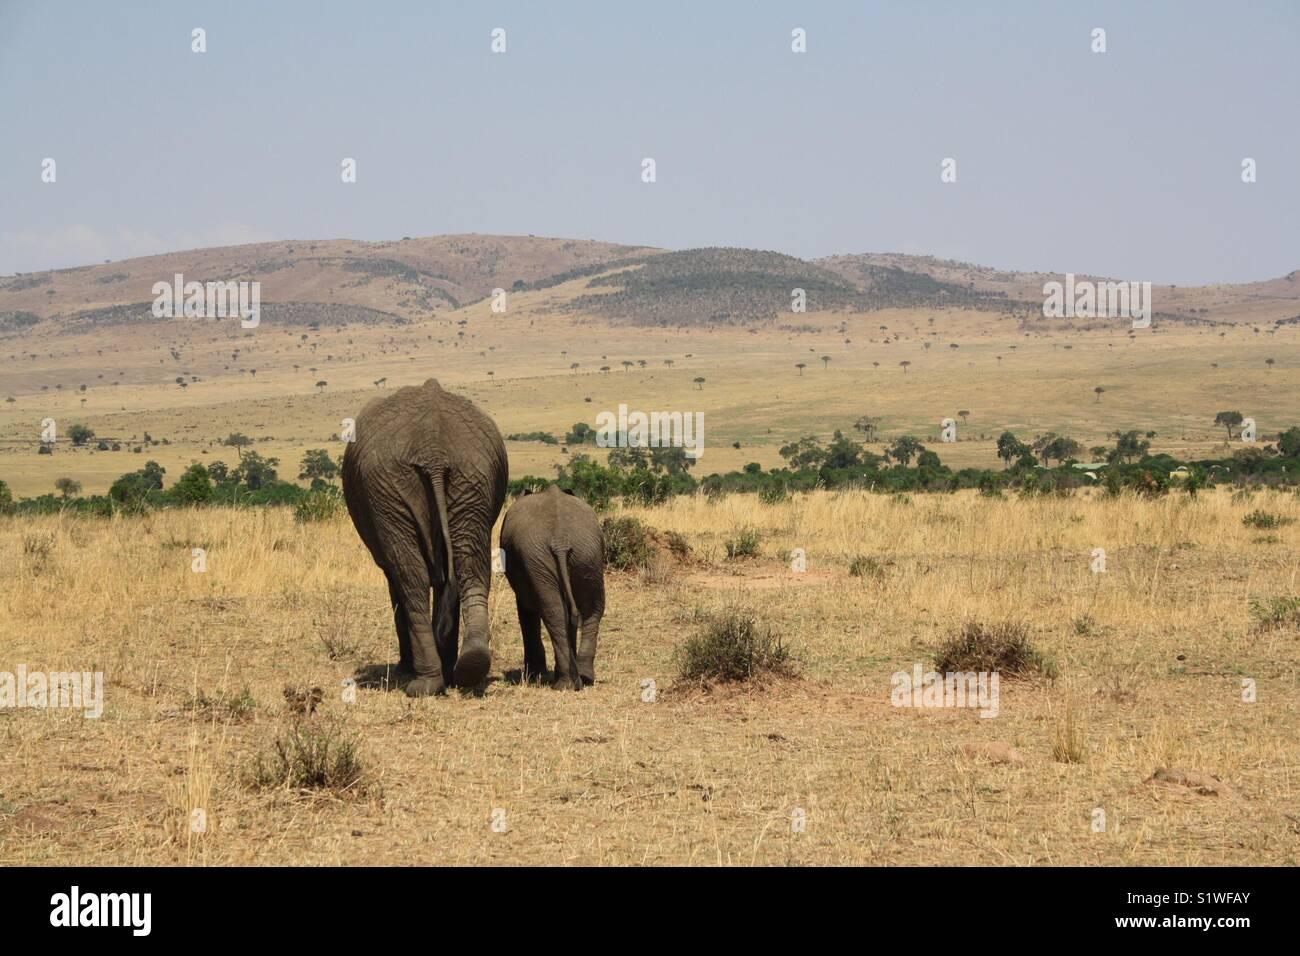 African Elephant Safari - Stock Image